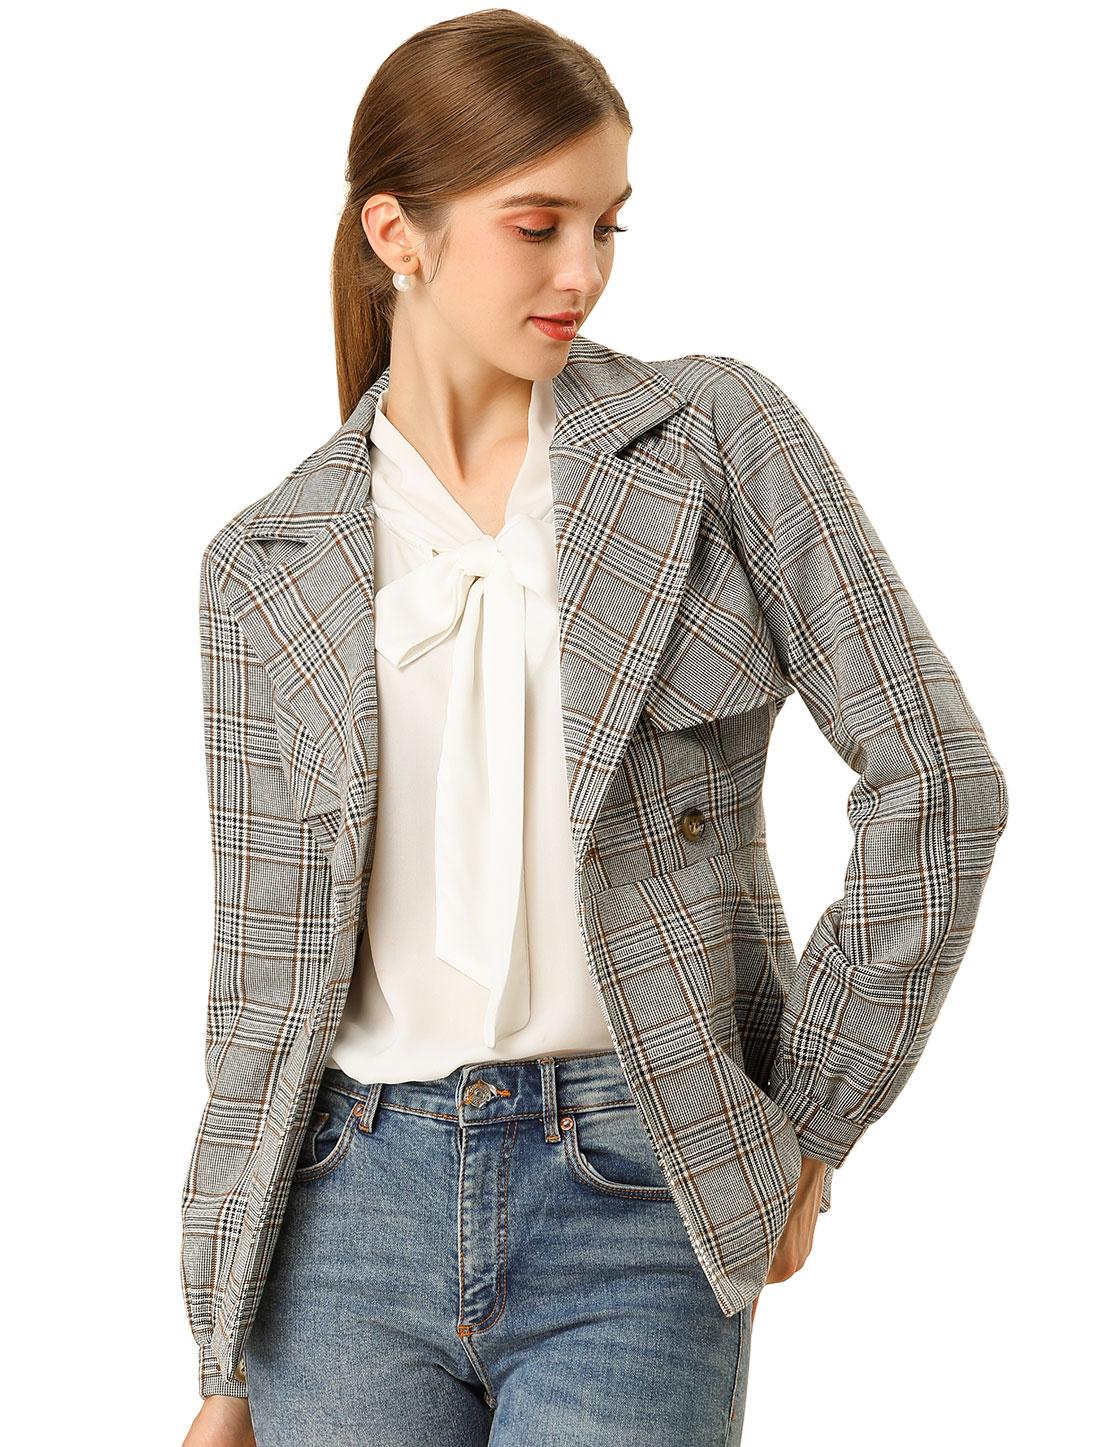 Allegra K Women's Plaid Jacket Button Outwear Checks Work Blazer Gray Khaki XL